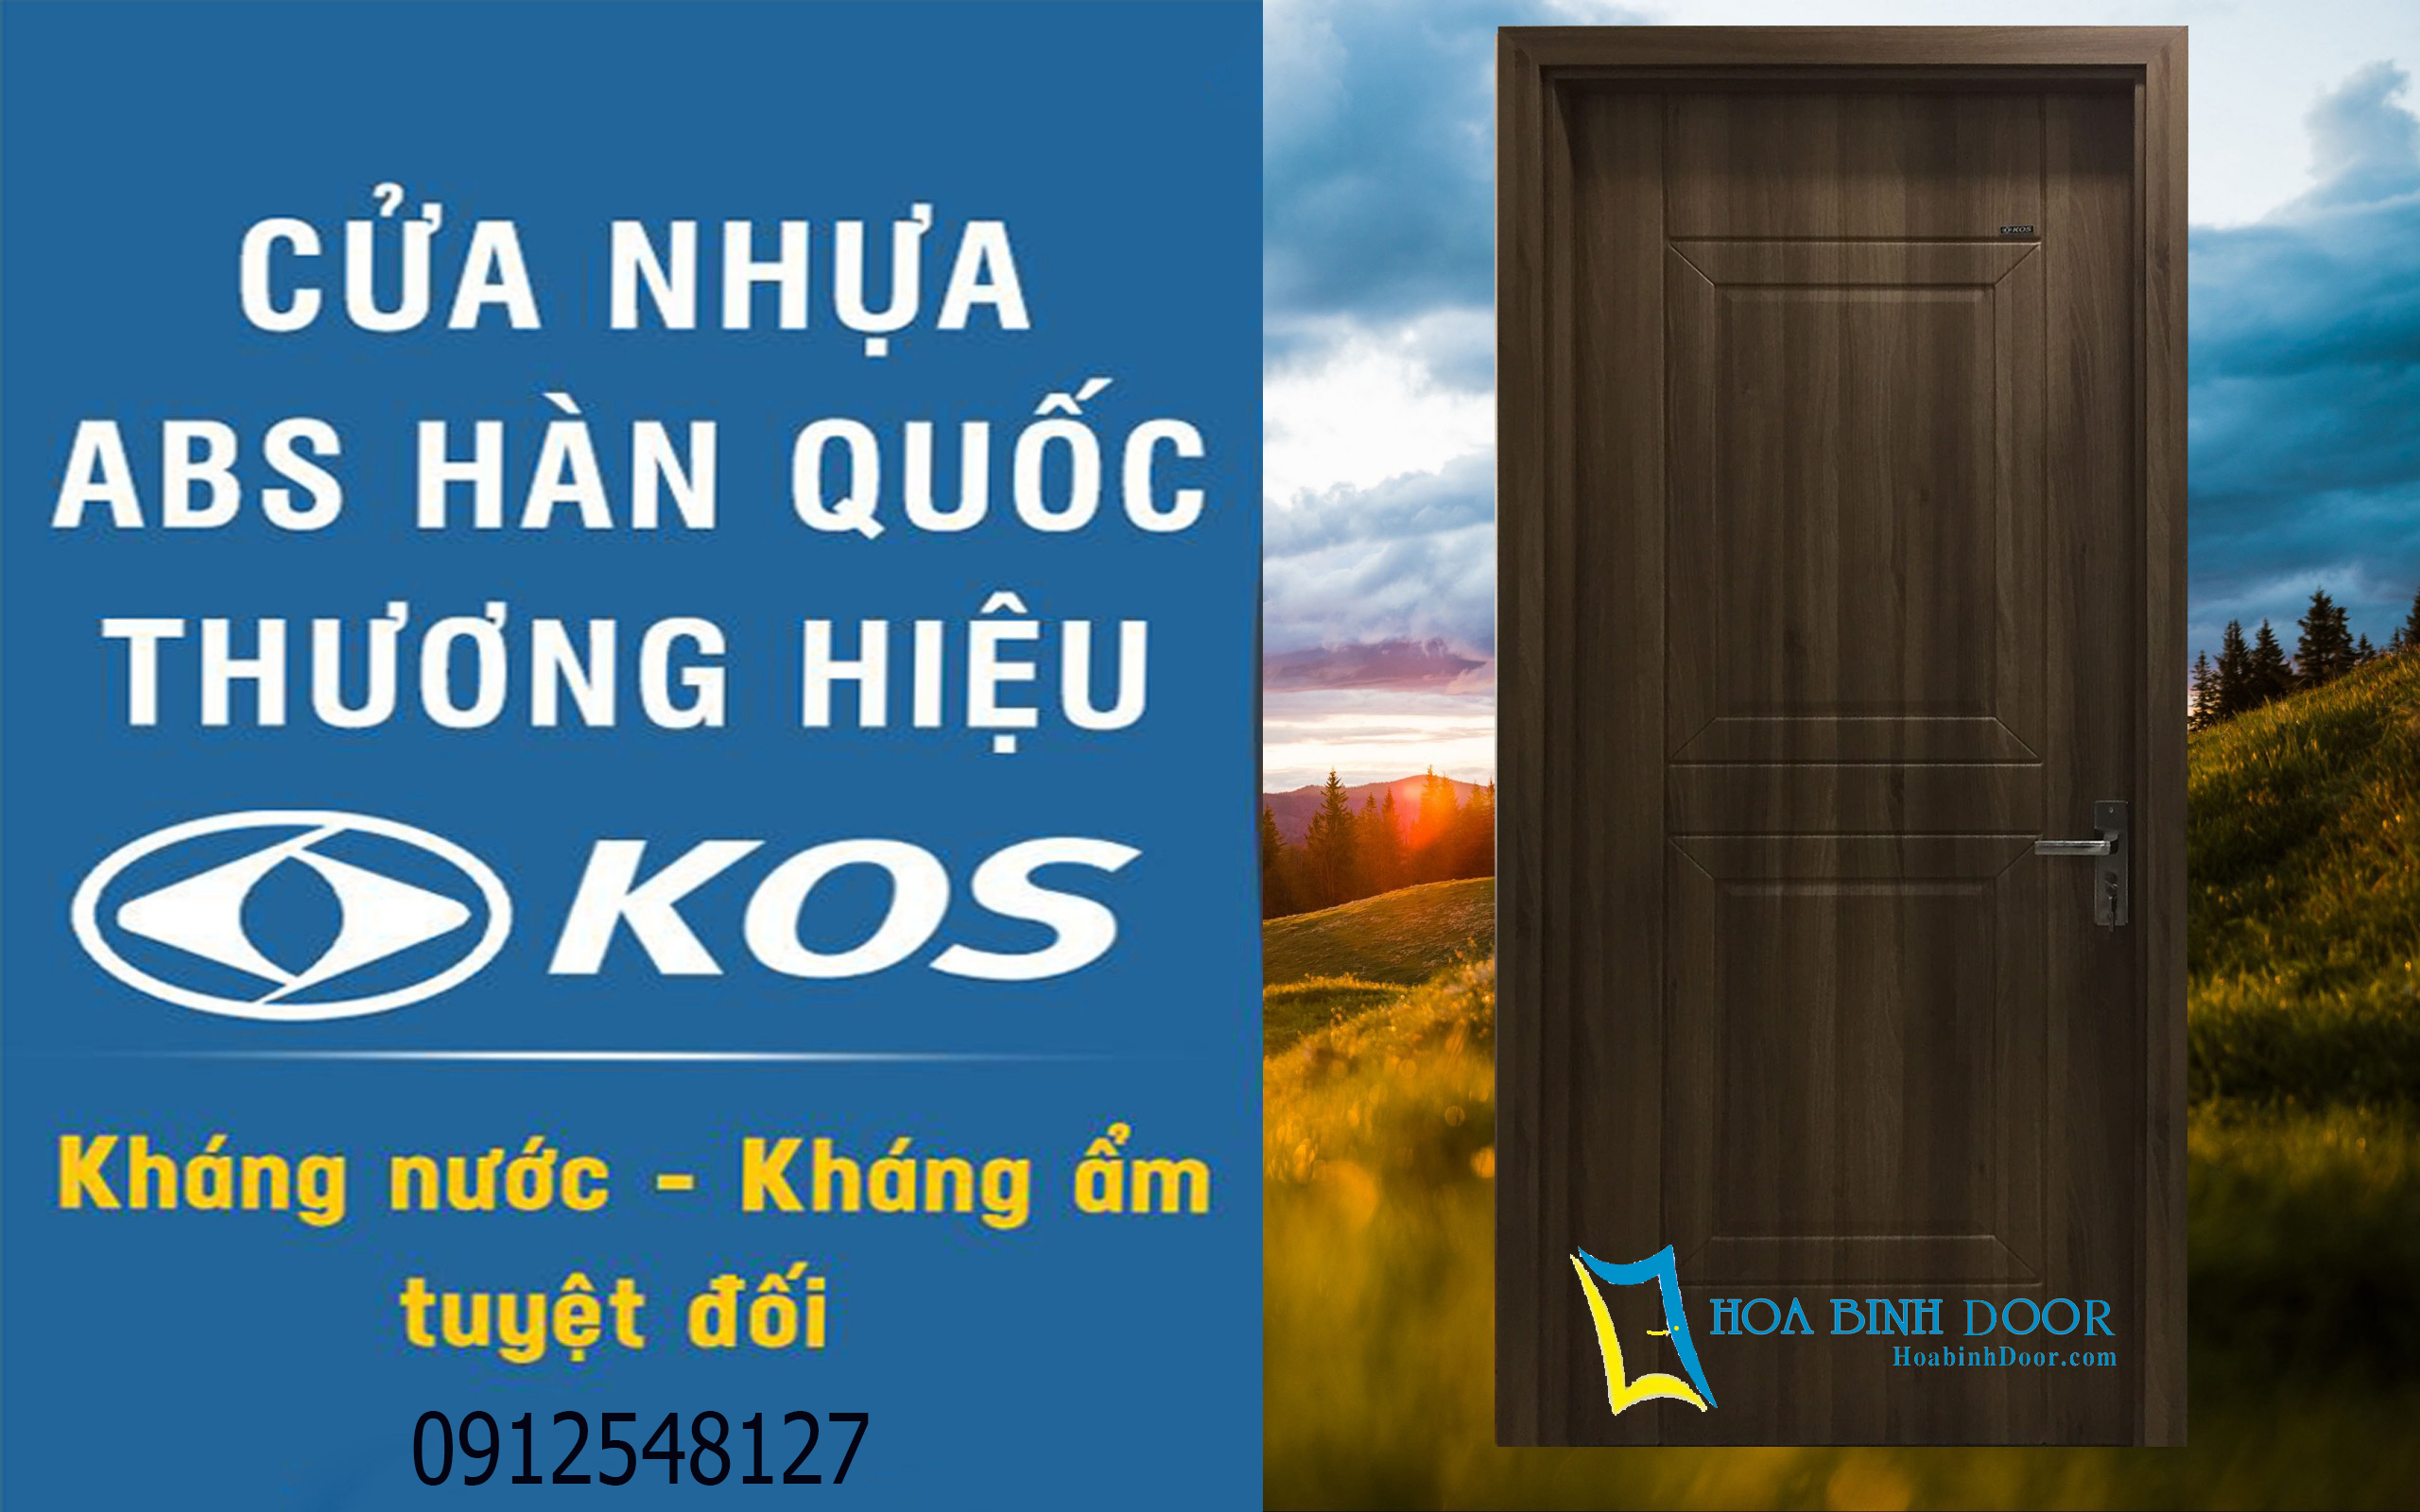 cua-nhua-abs-han-quoc-chinh-hang